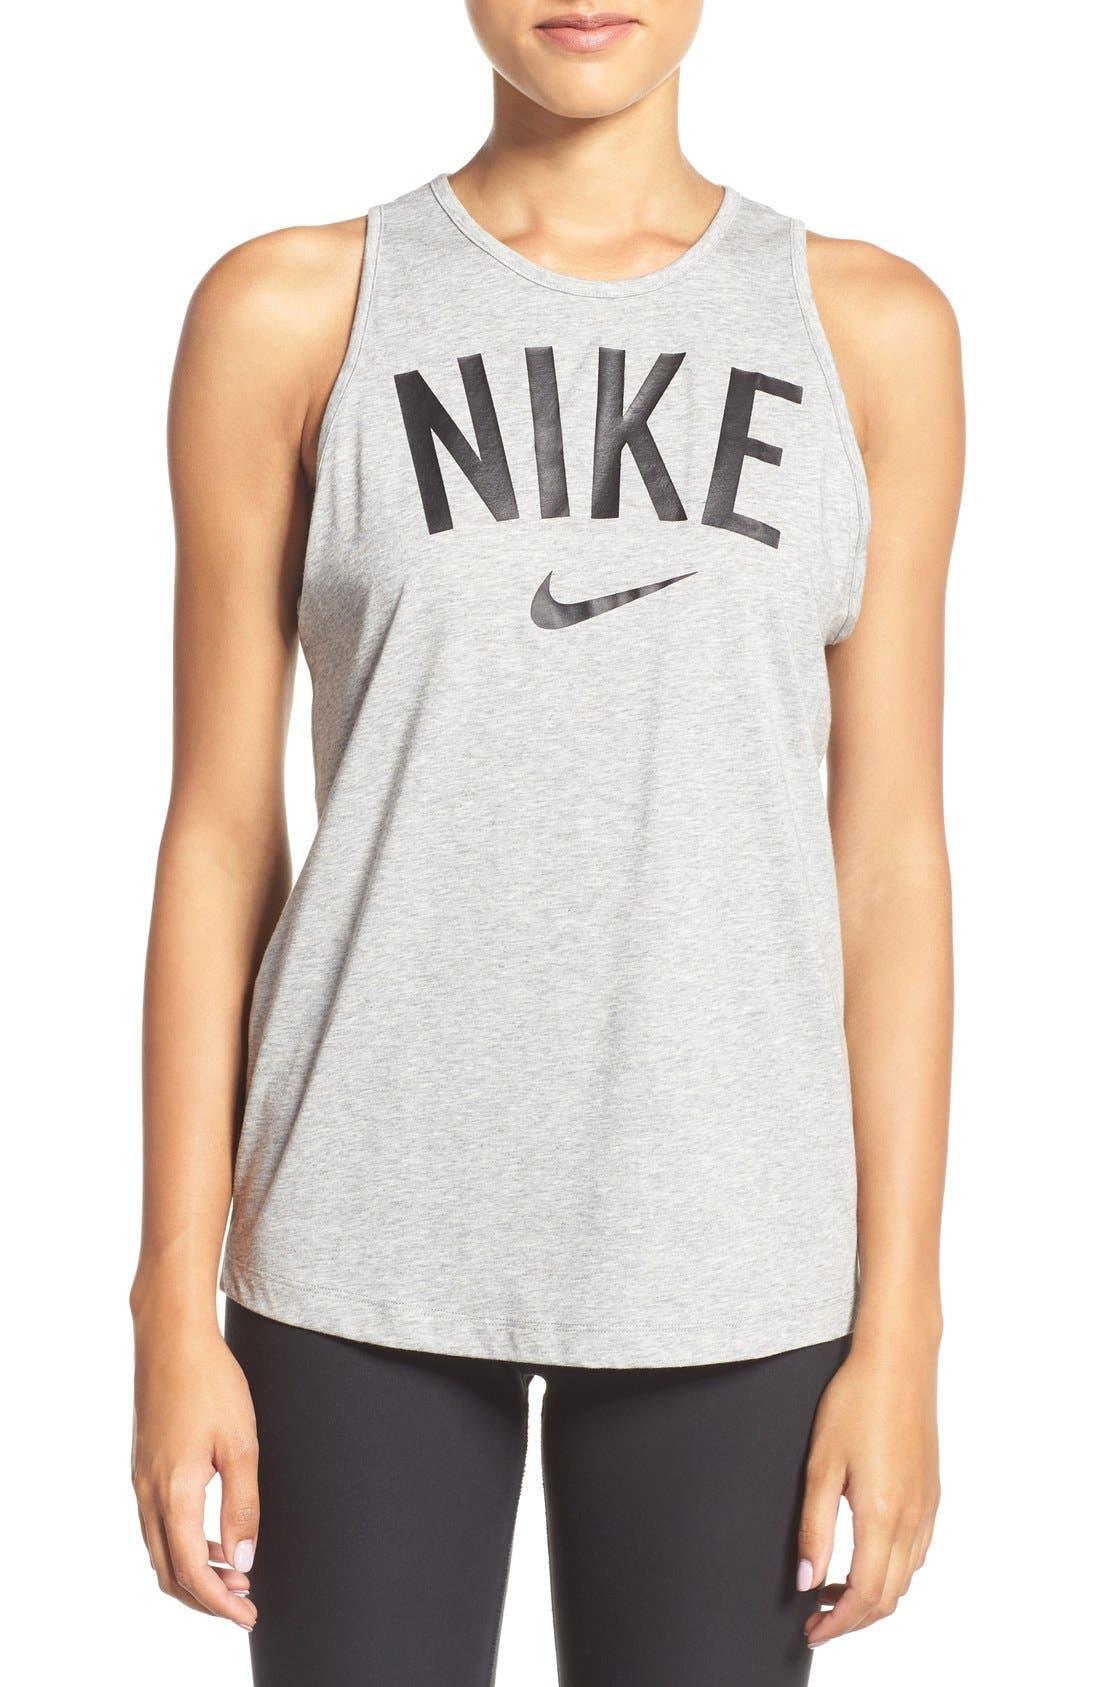 Alternate Image 1 Selected - Nike 'Tomboy' Graphic Tank